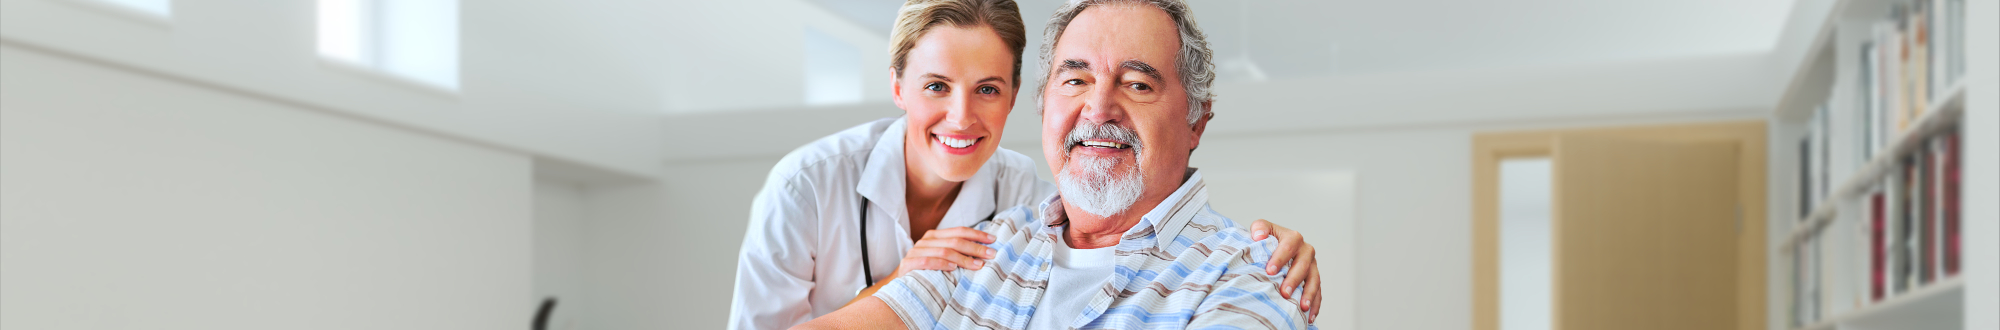 portrait of senior man and nurse